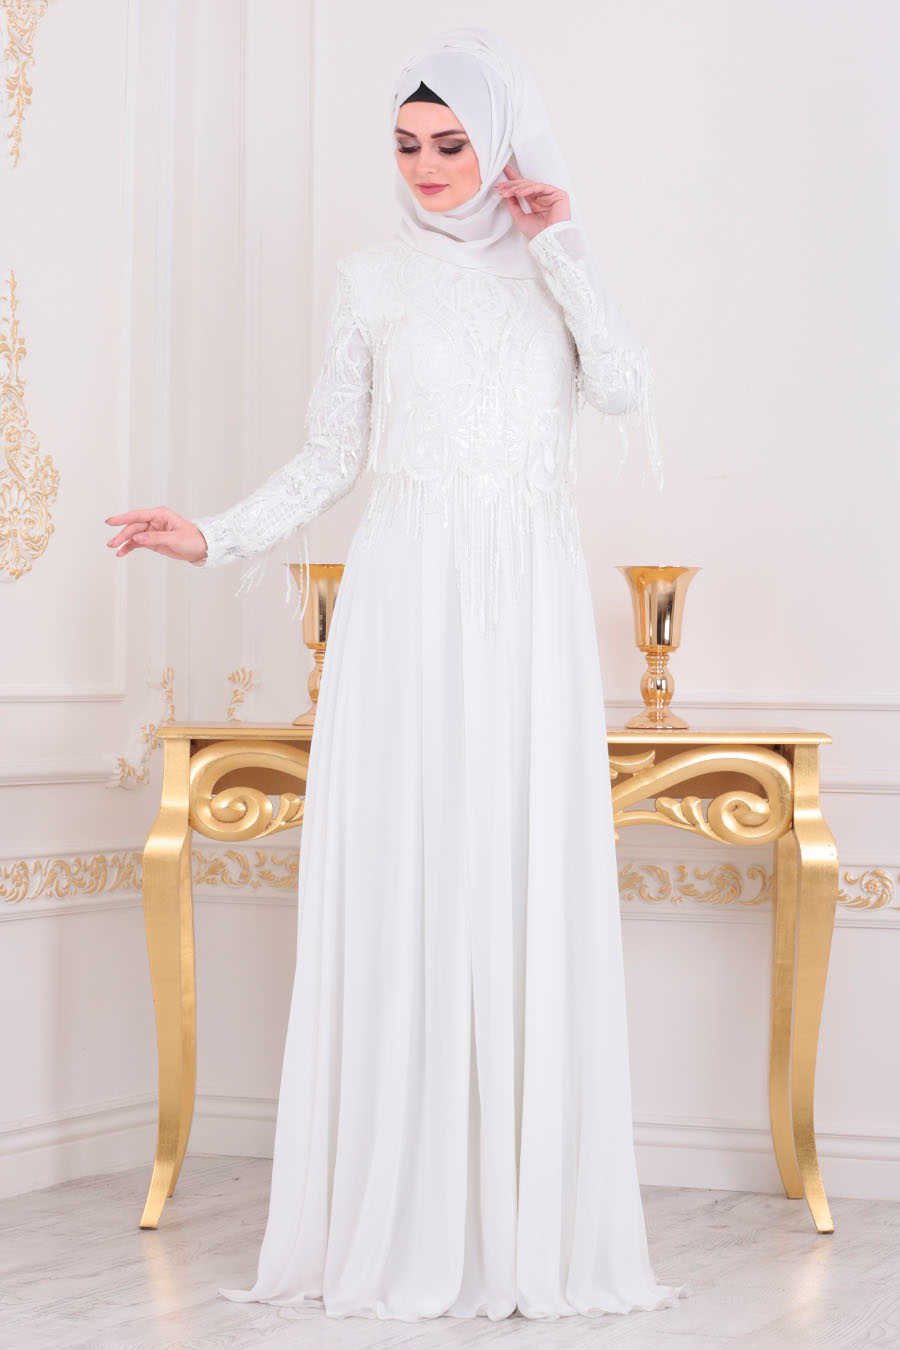 543661166ca5 Neva Style - White Hijab Evening Dress 4591B - Neva-style.com